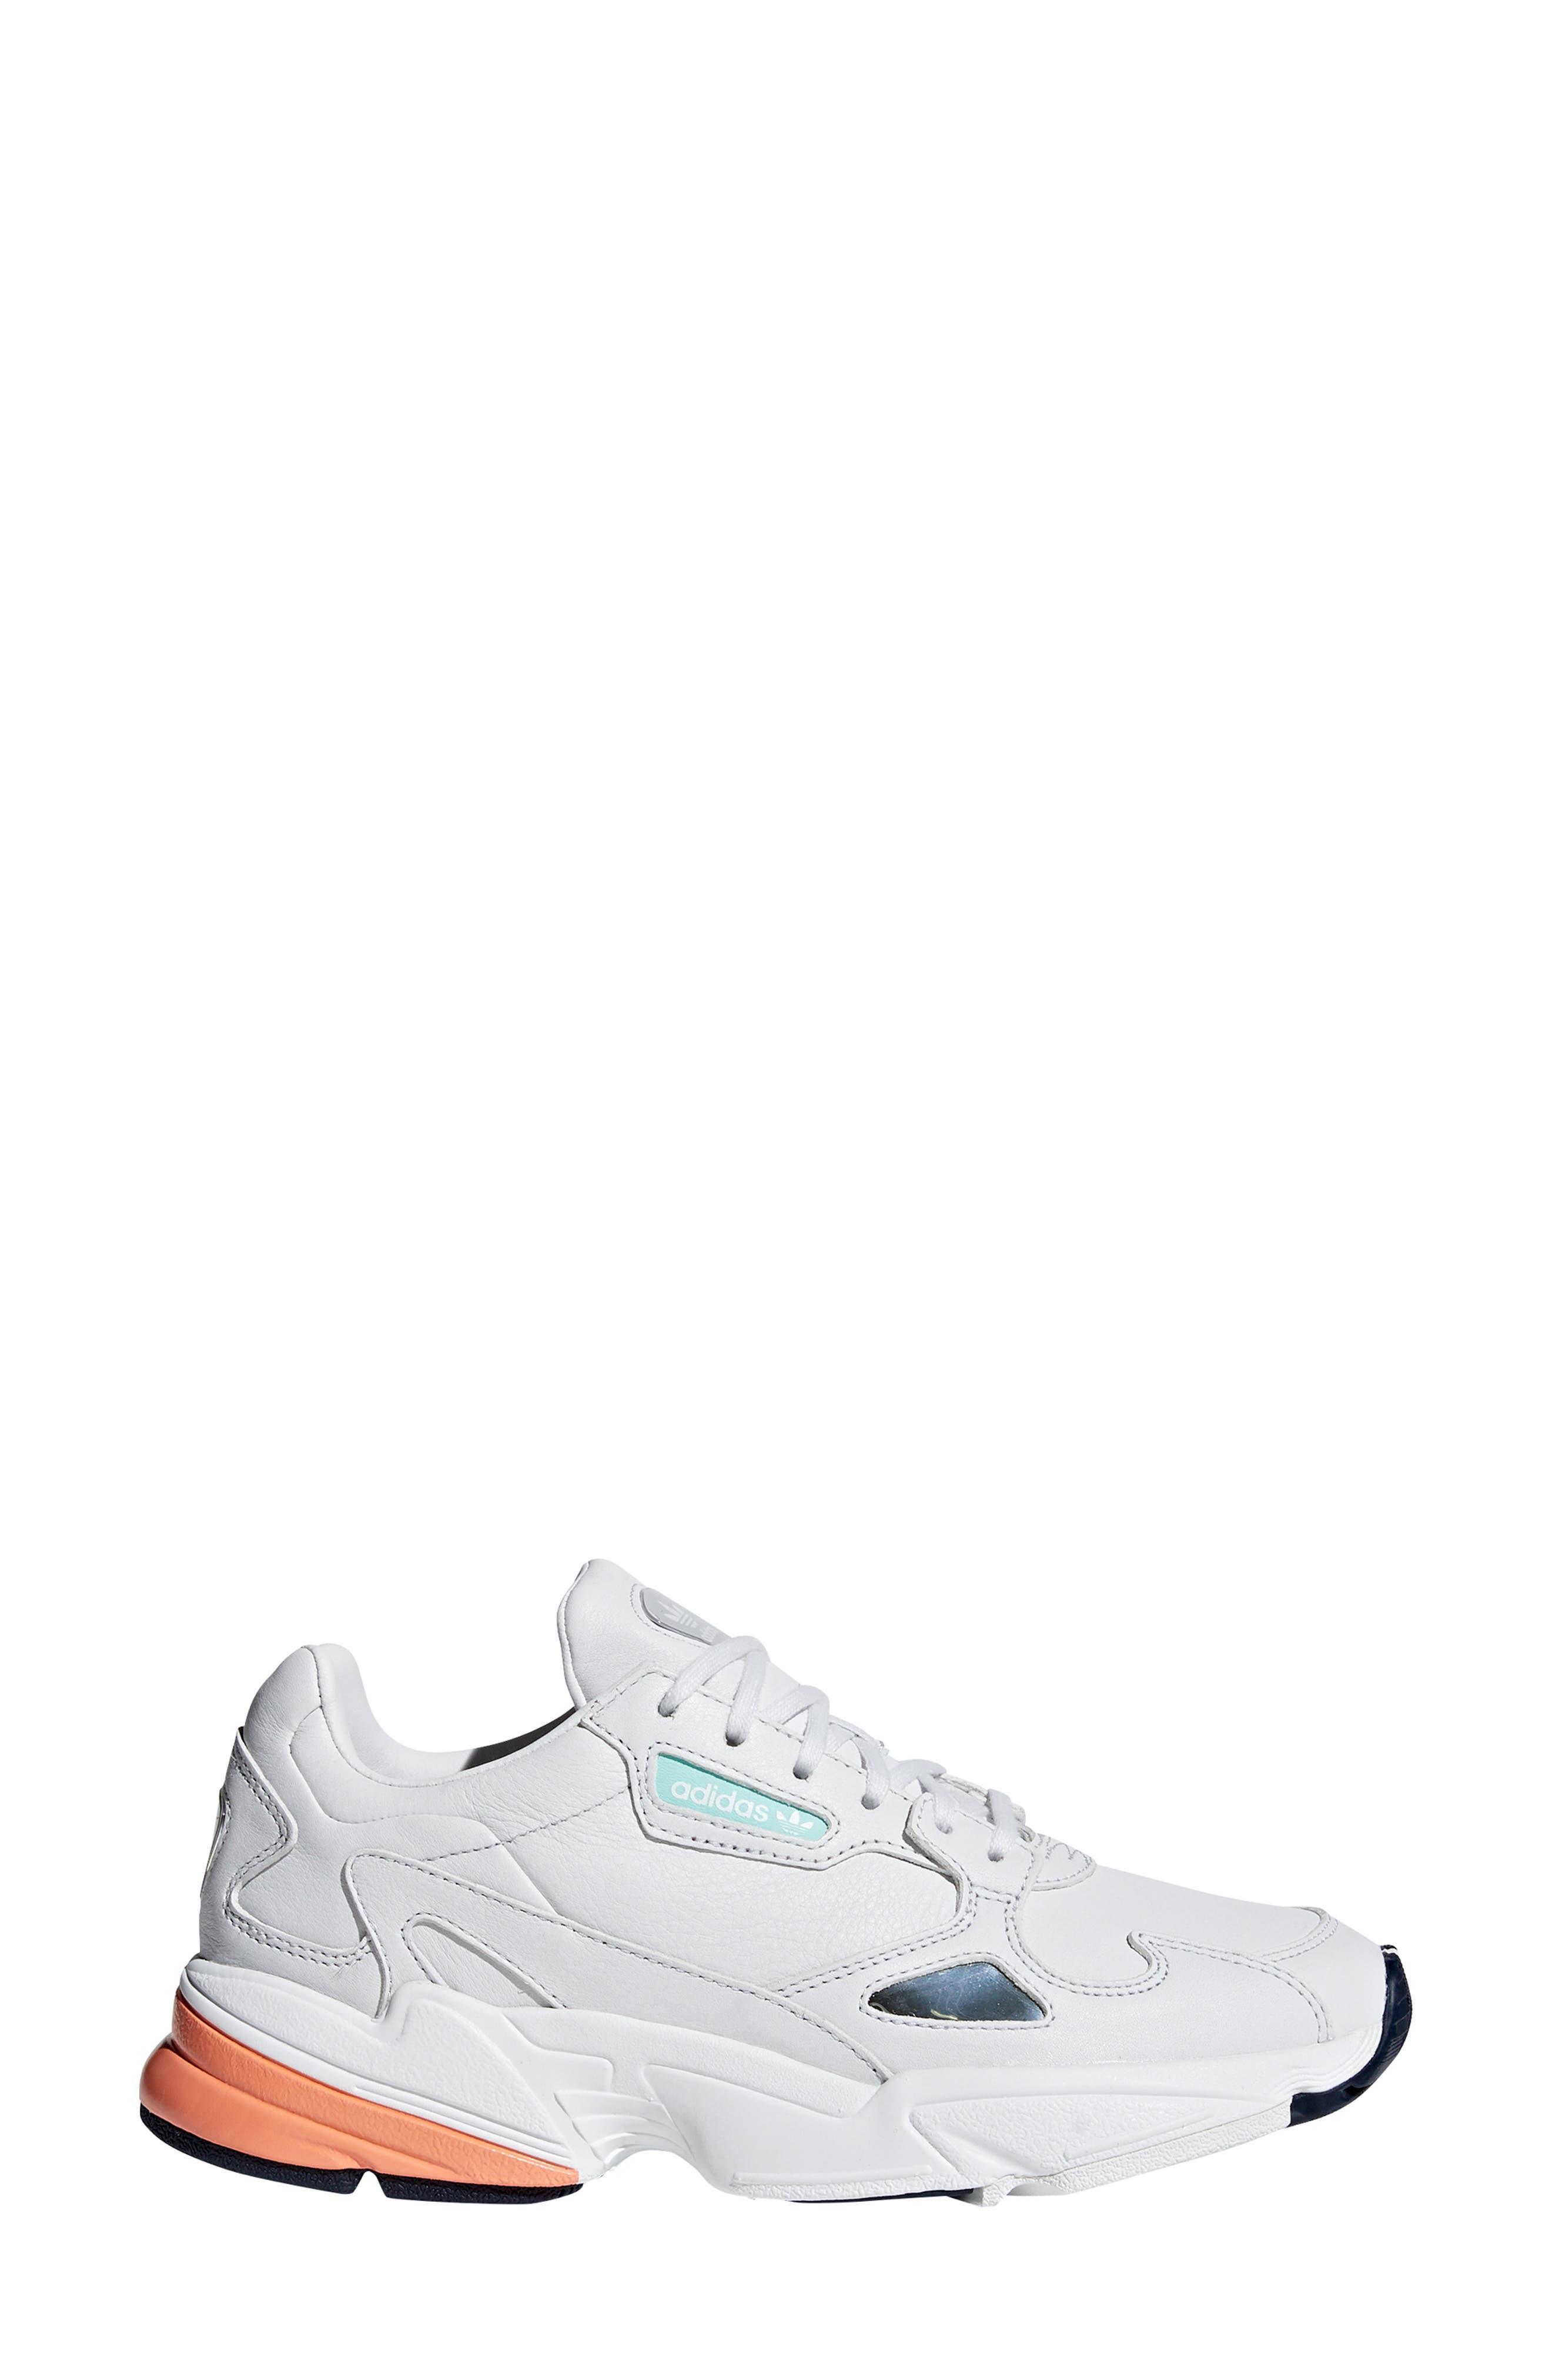 Falcon Sneaker,                             Alternate thumbnail 6, color,                             CRYSTAL WHITE/ EASY ORANGE